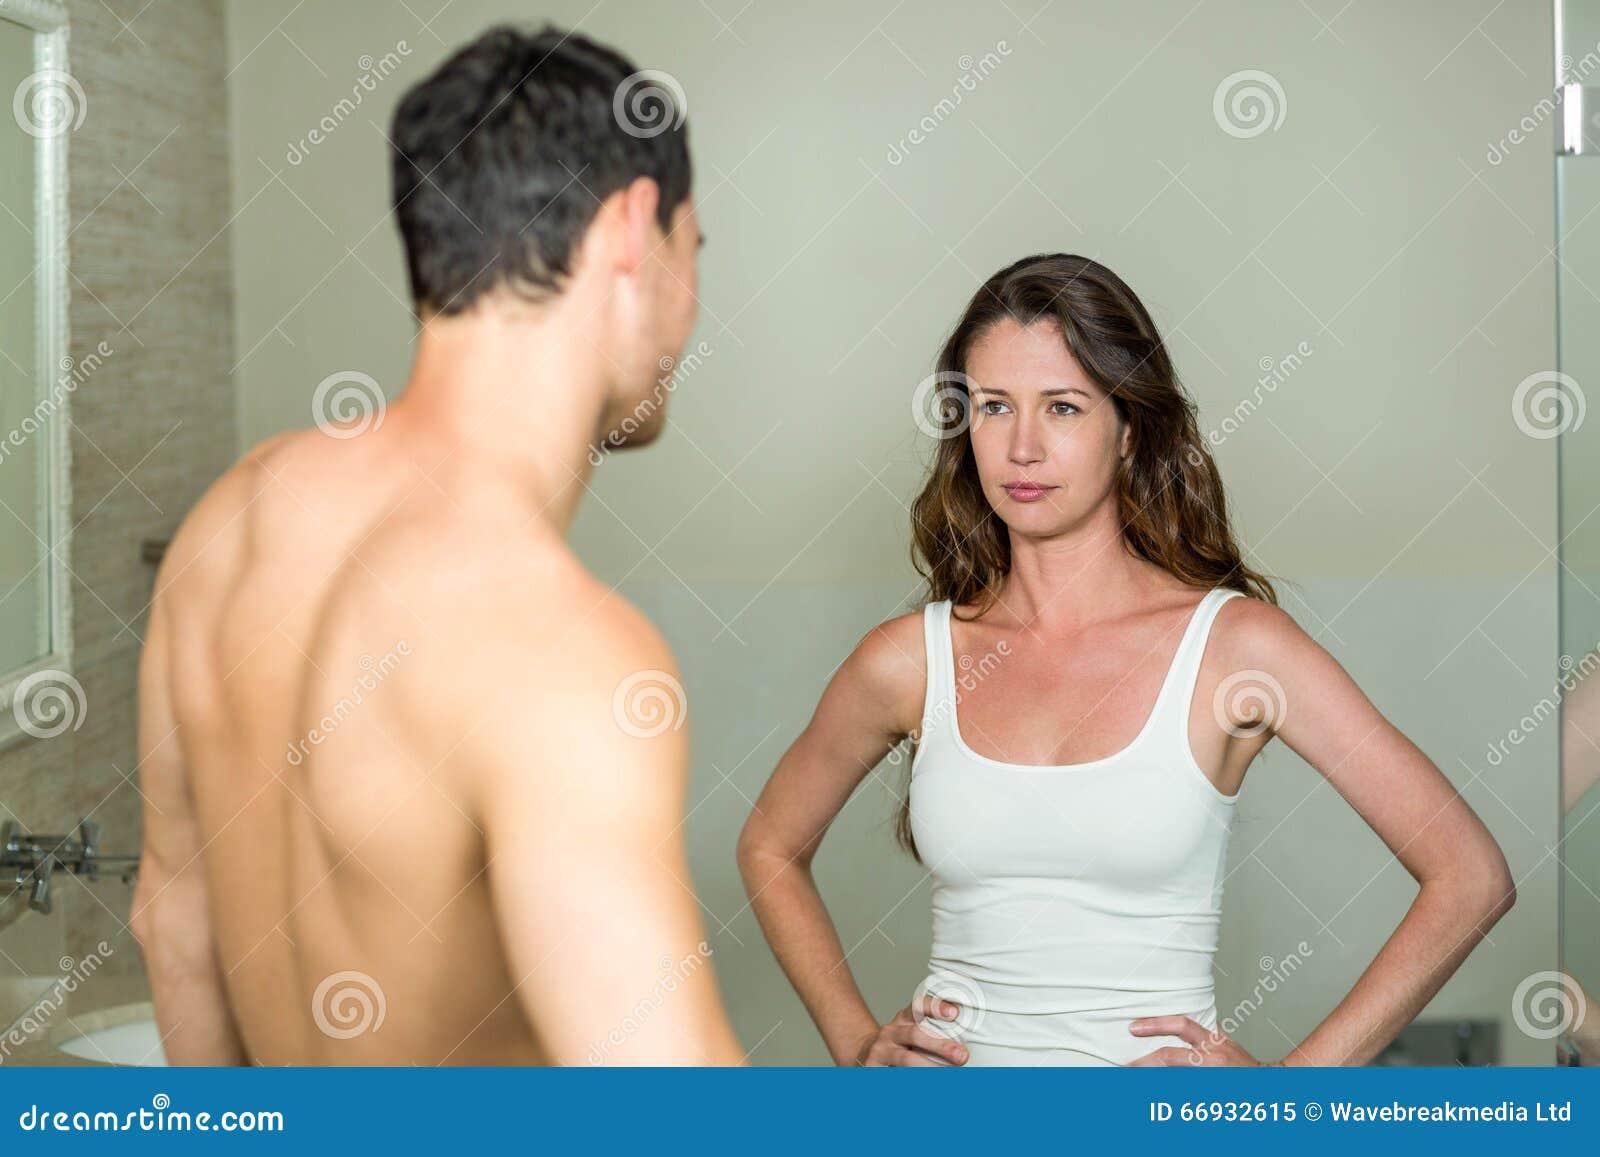 Women looking for men free